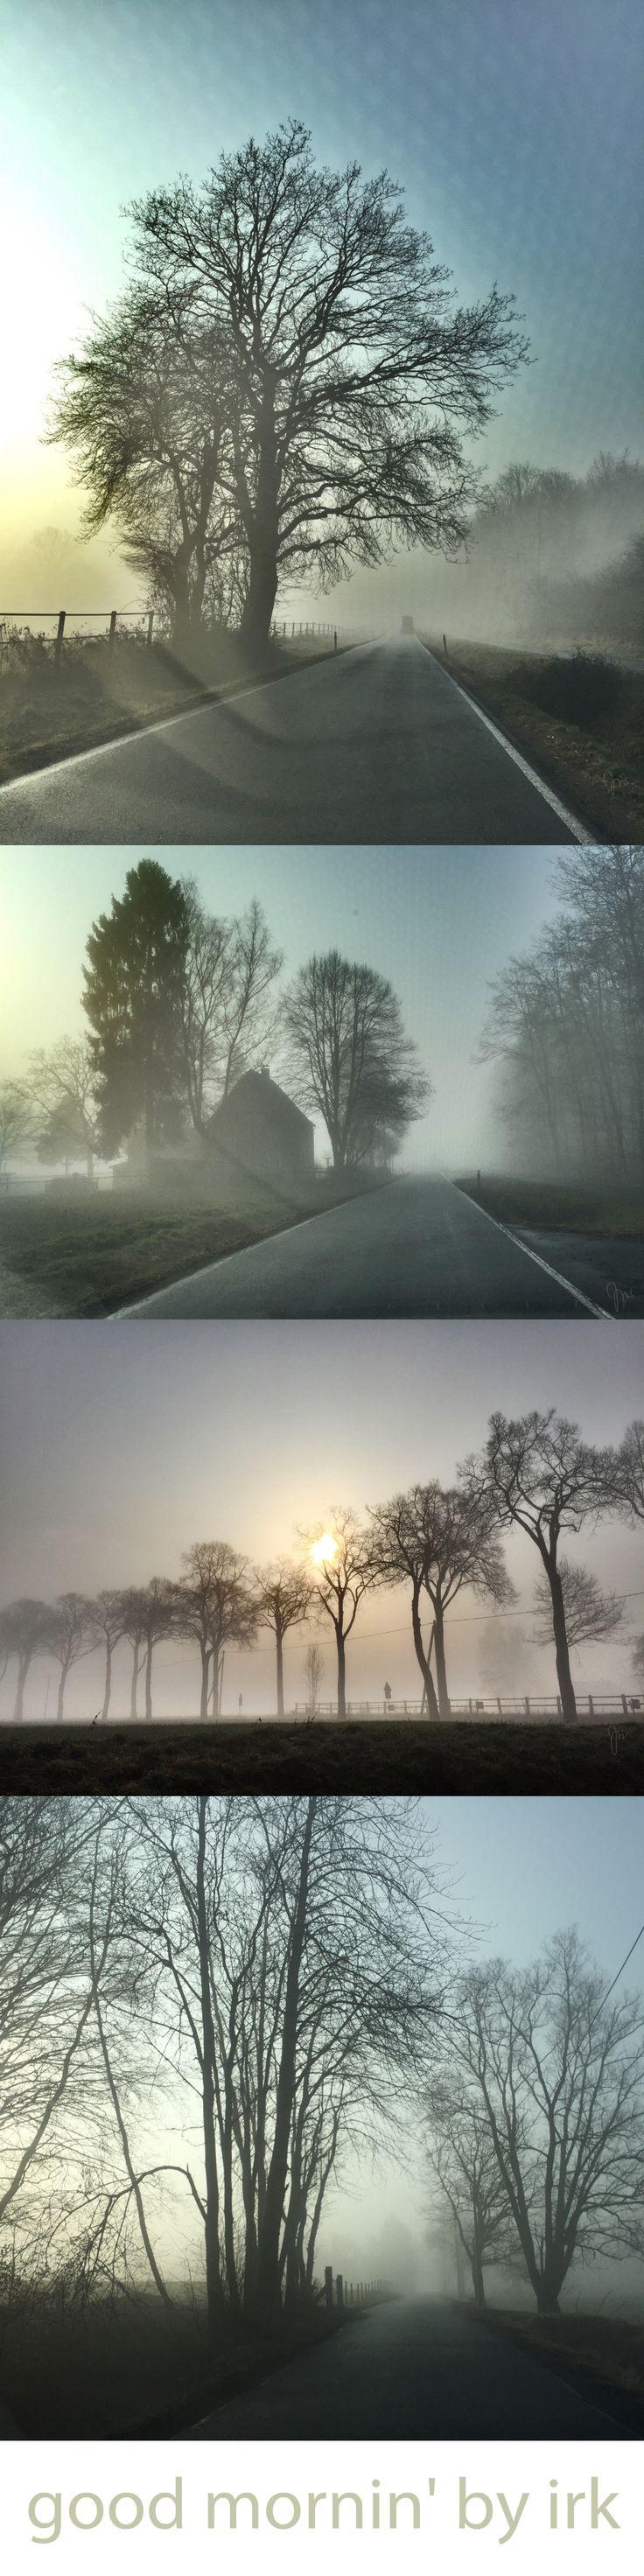 foggy morning - Guten Morgen Fotos Landschaft mit Nebel - Good morning photos fog landscape - by irk germany / smartphone photography